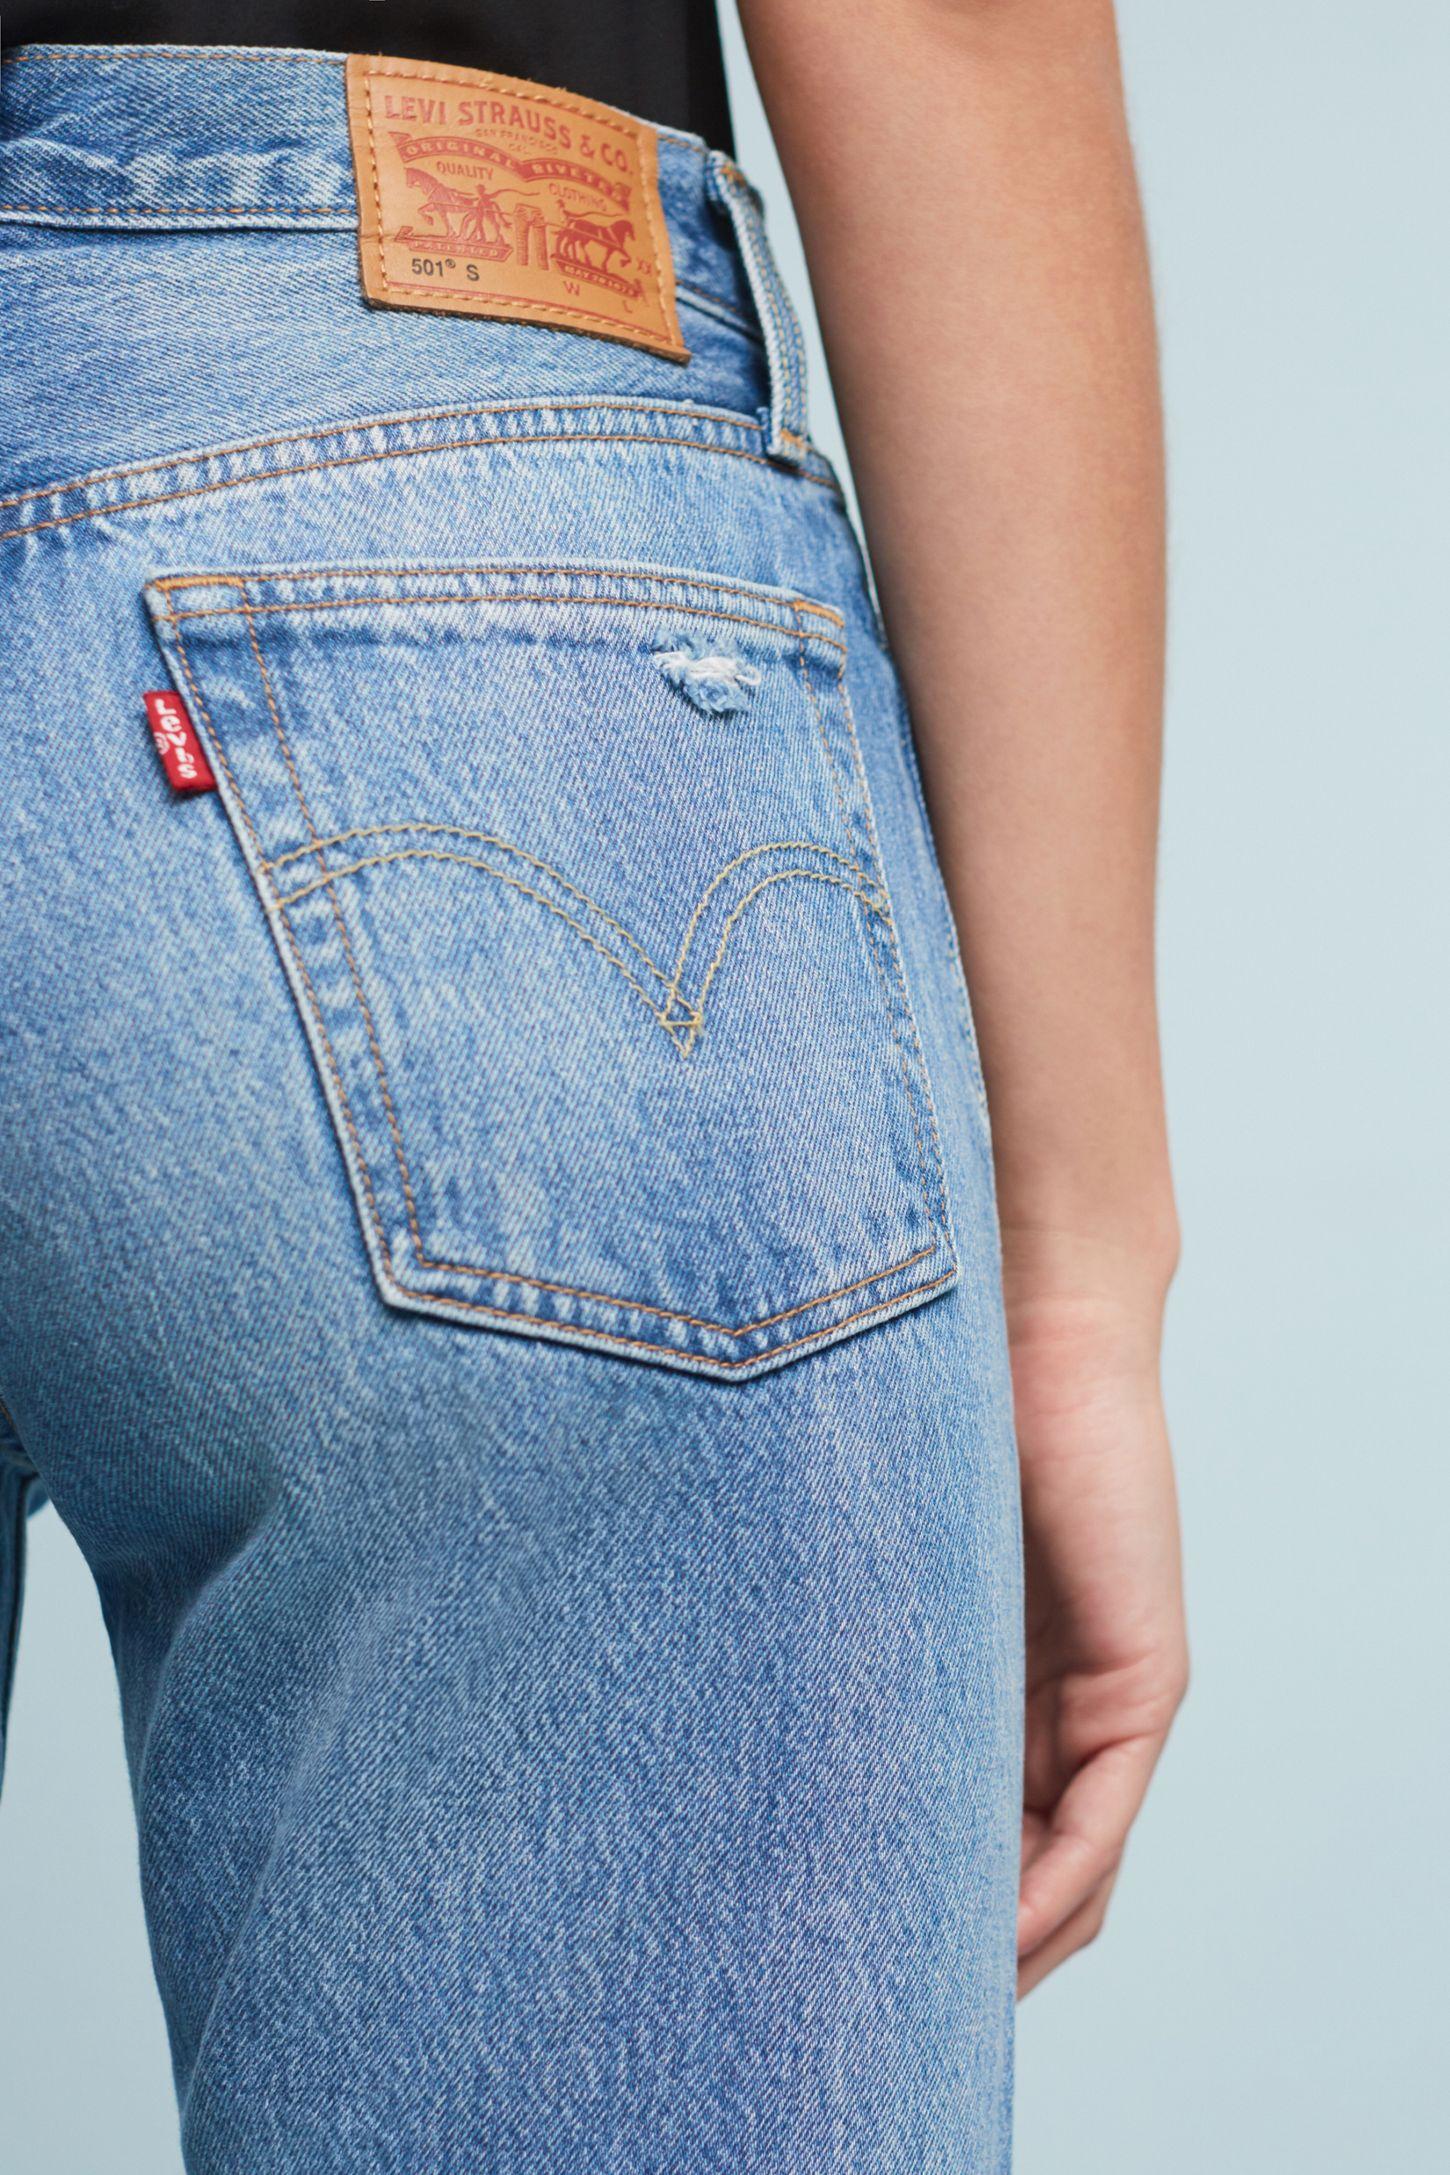 52286cb3 Levi's 501 Ultra High-Rise Skinny Jeans | Anthropologie